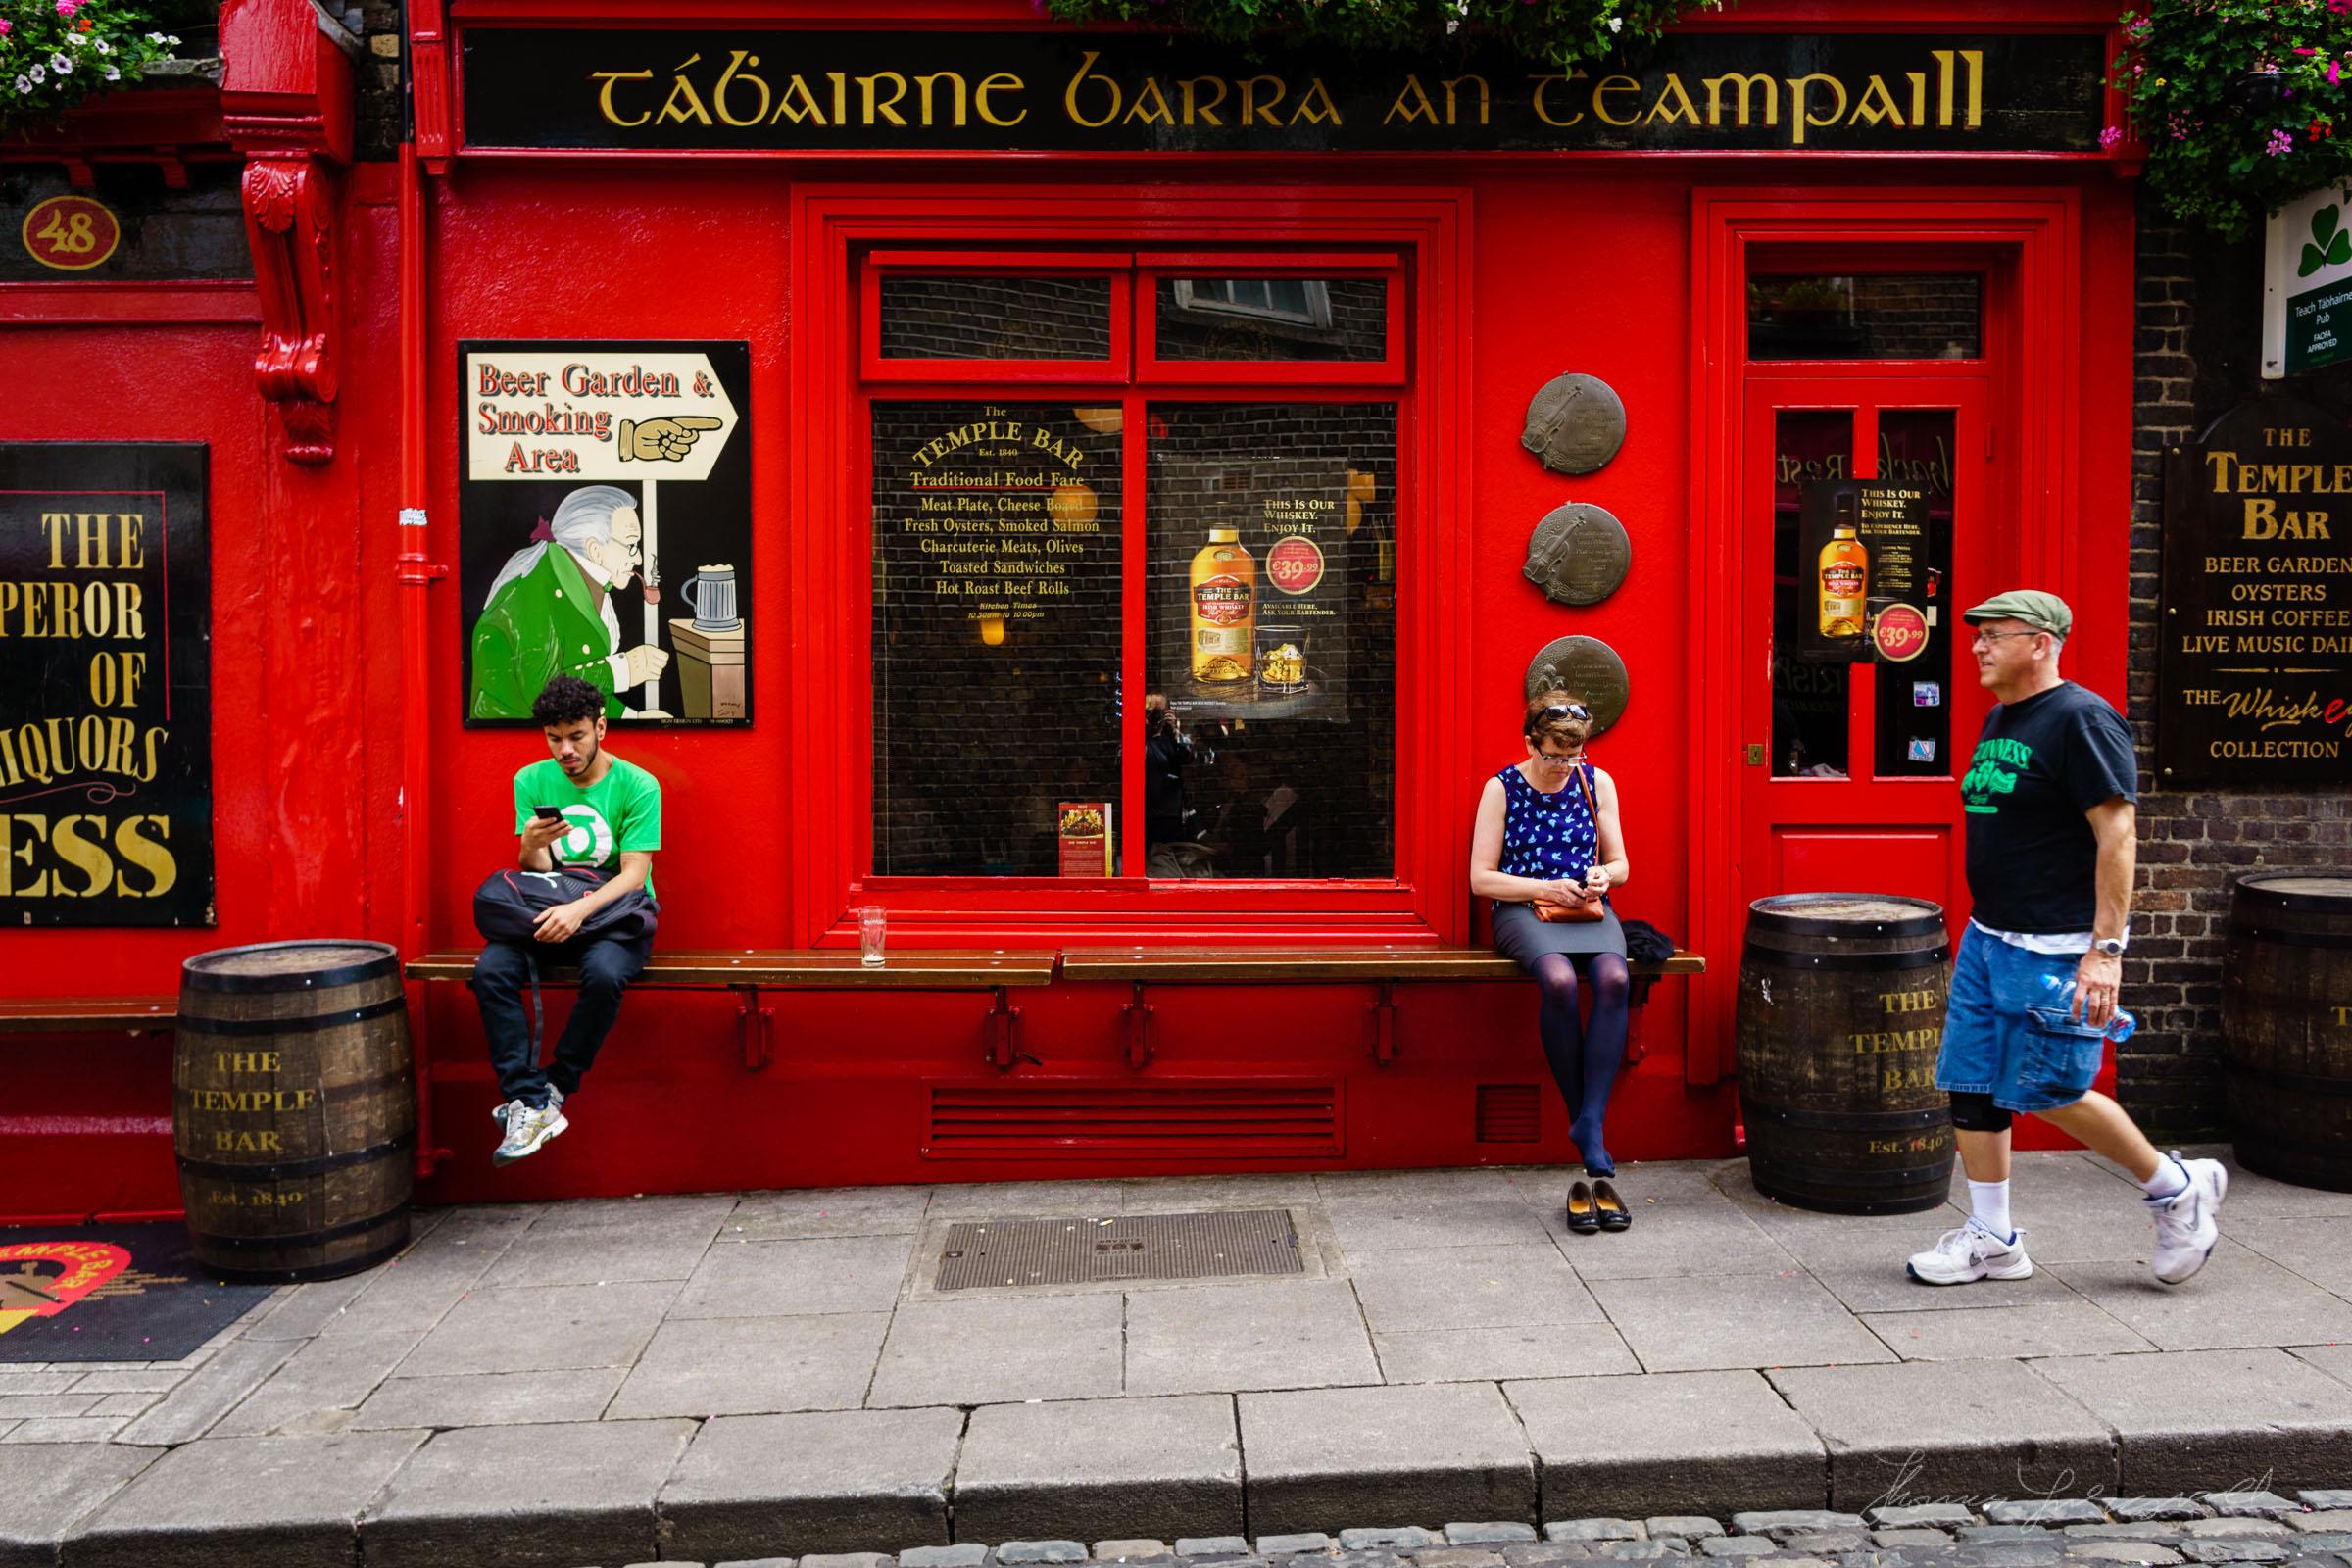 TheTemple Bar Pub